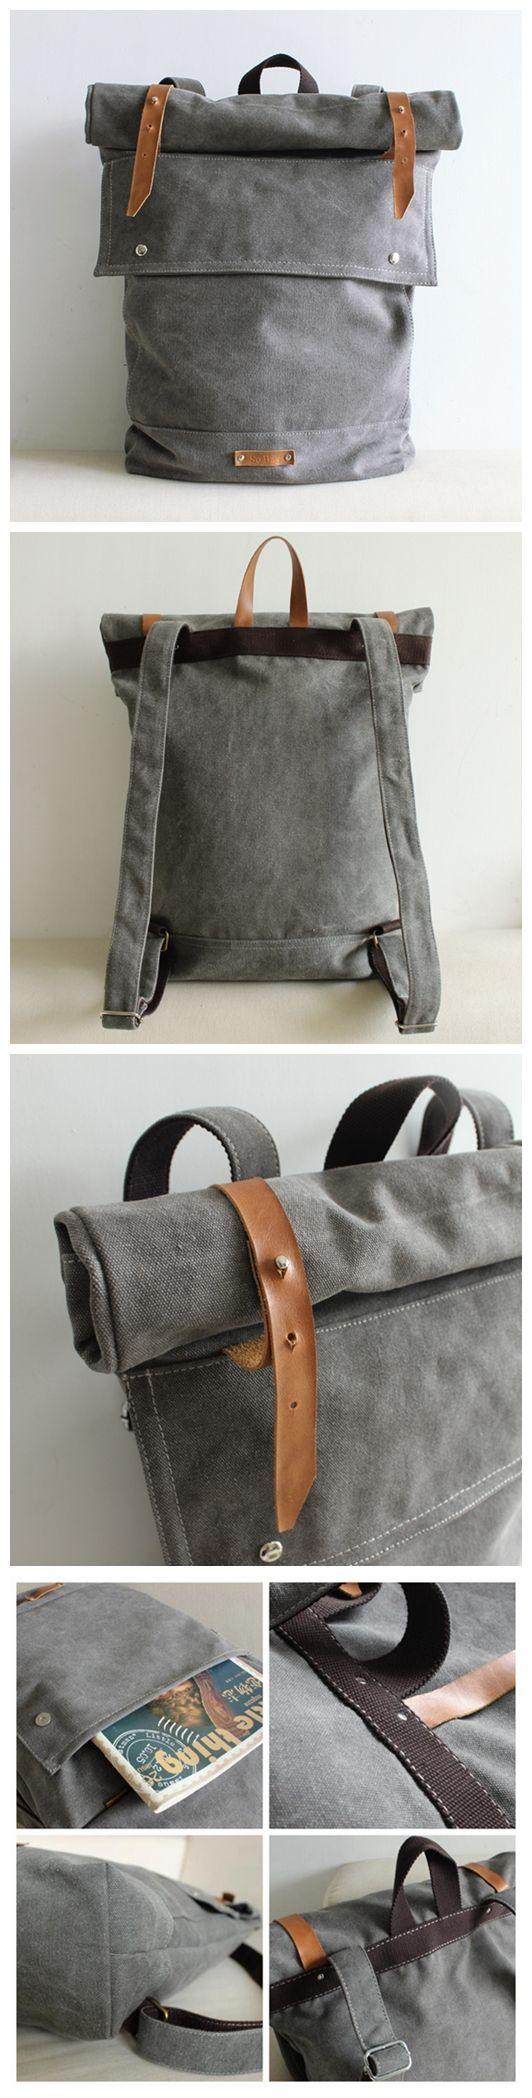 Waxed Canvas Backpack Waterproof Travel Backpack School Backpack